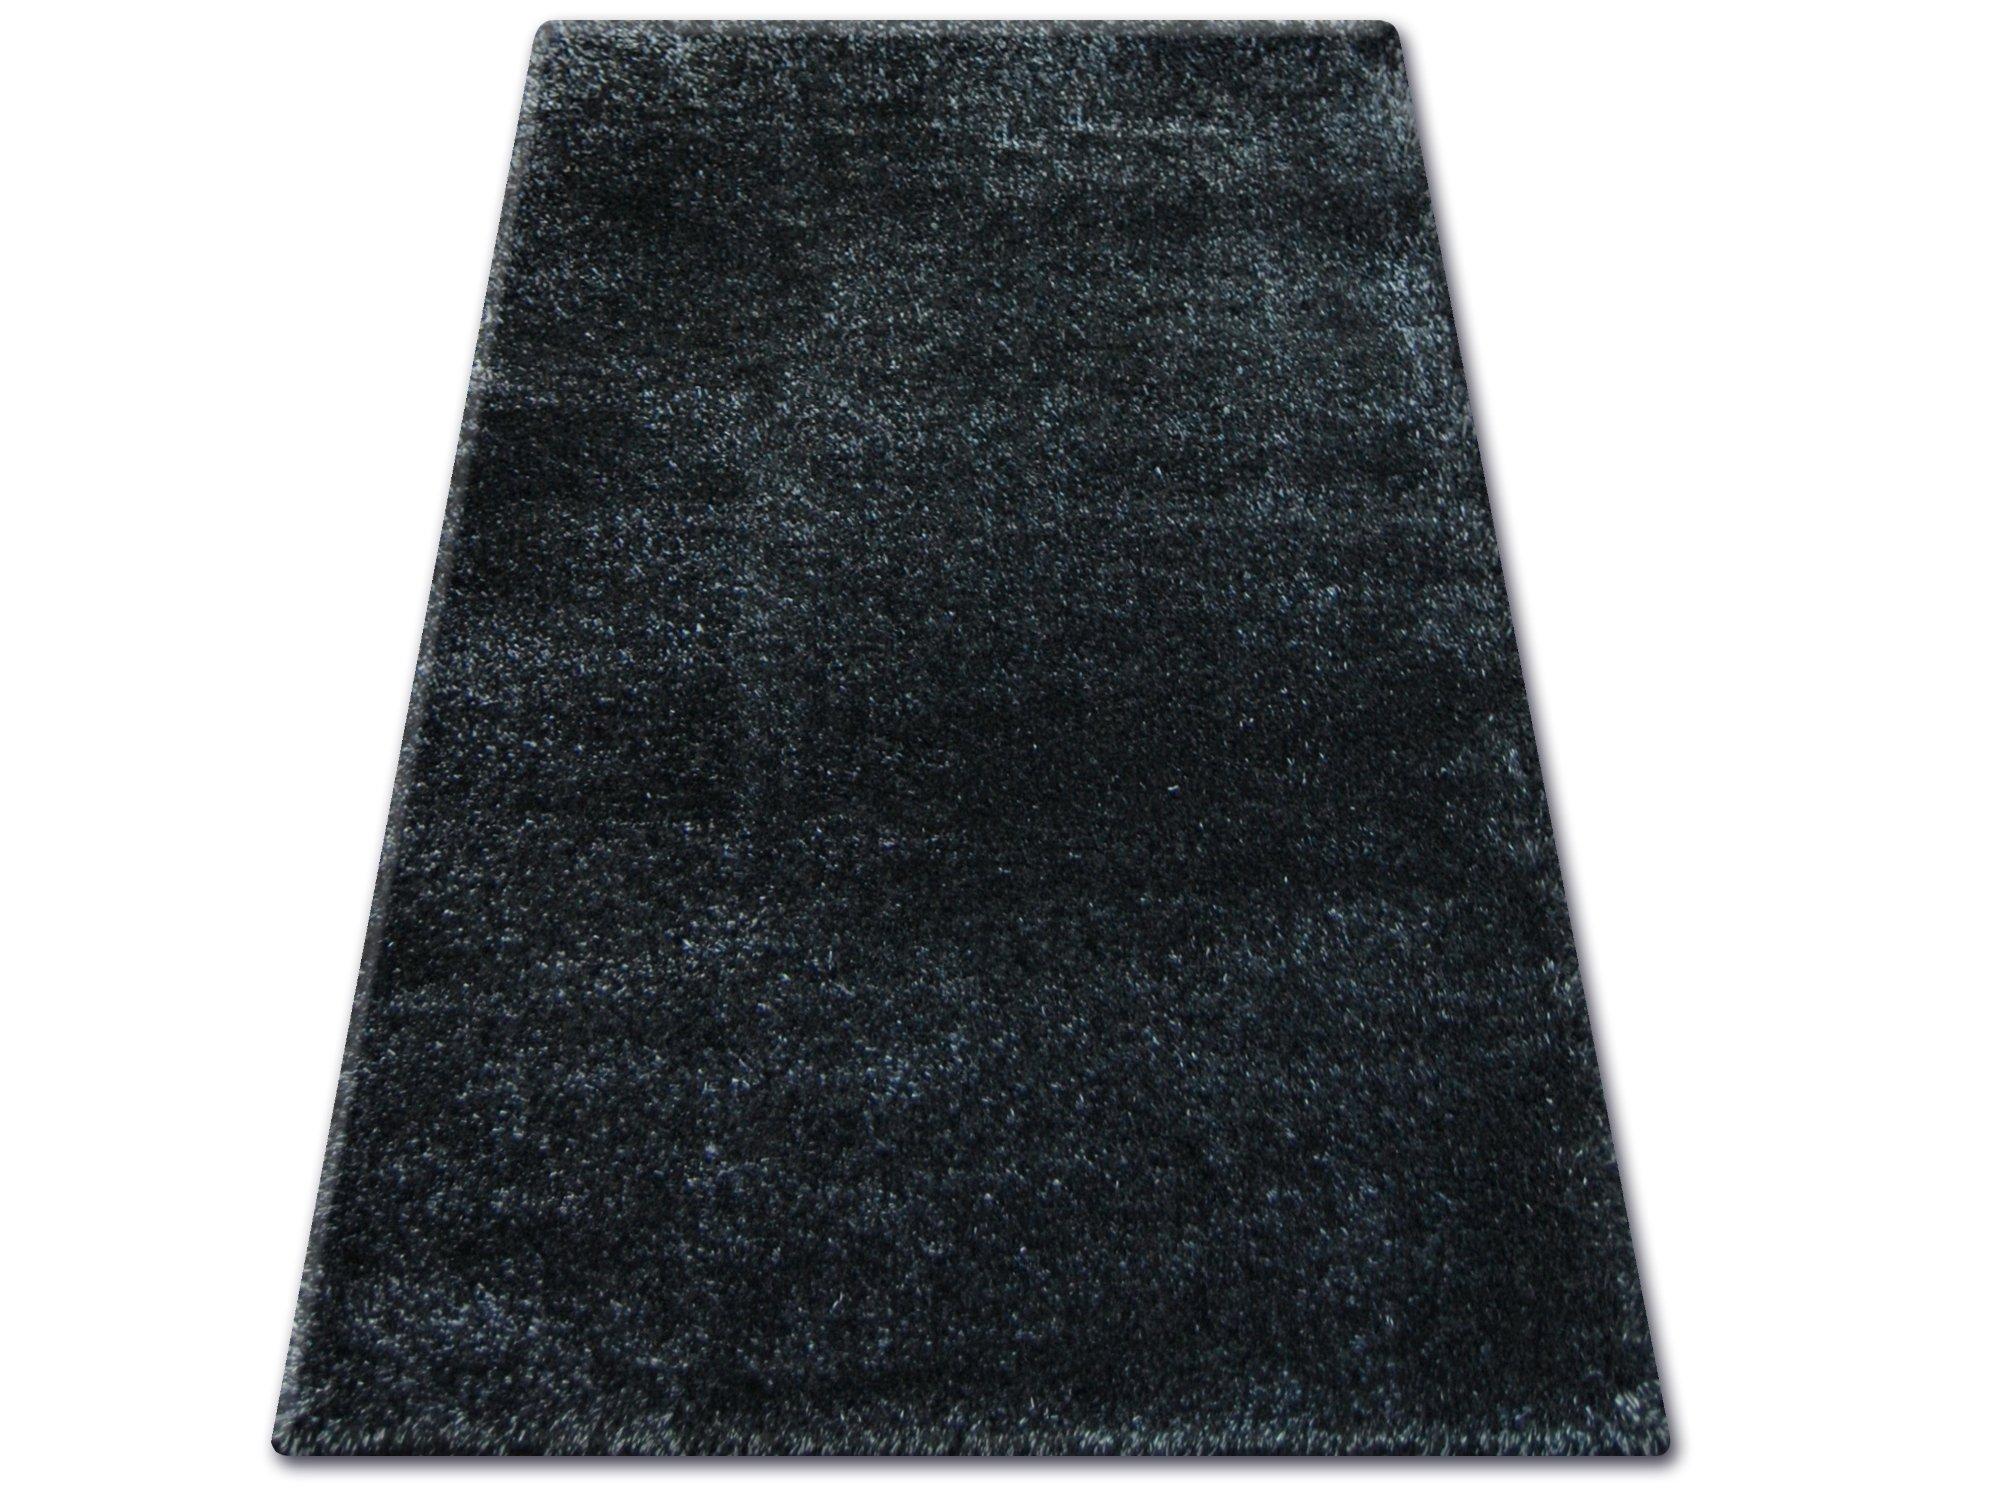 KOBERCE ŁUSZCZÓW NARIN 120x170 black soft #GR394